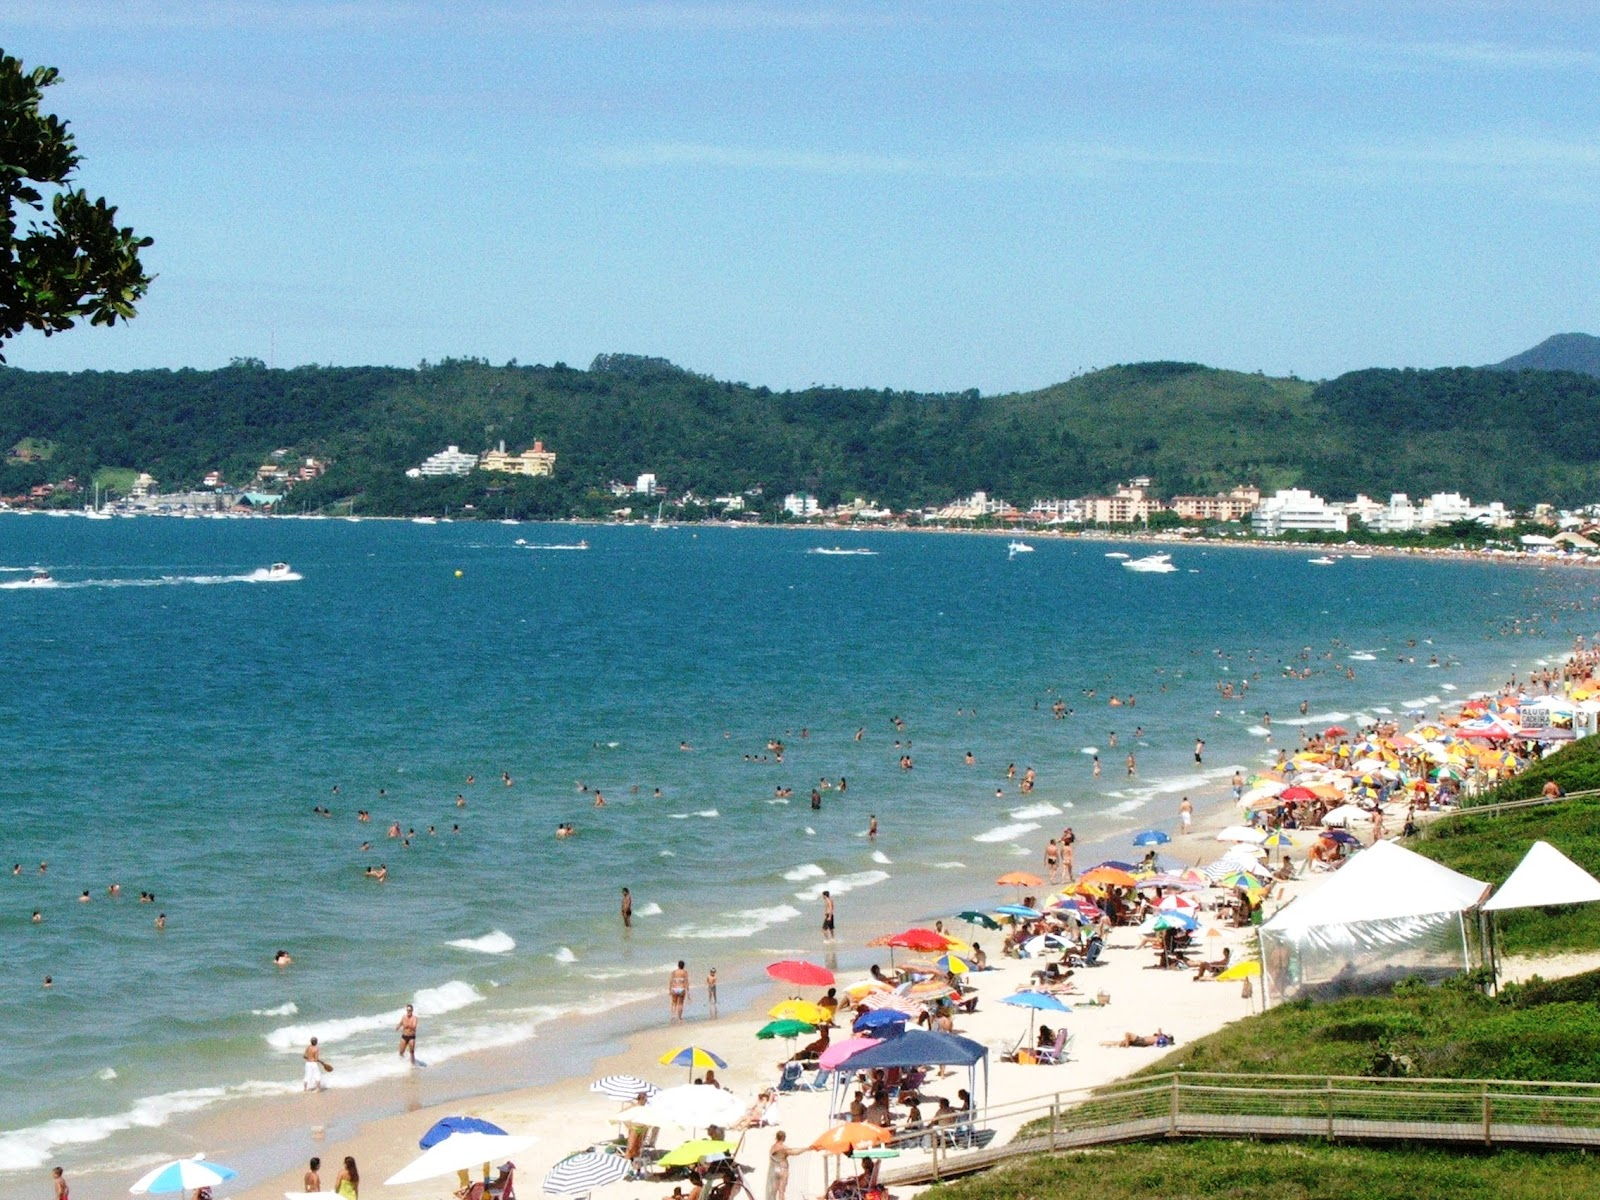 Praia jerere internacional - 3 part 6